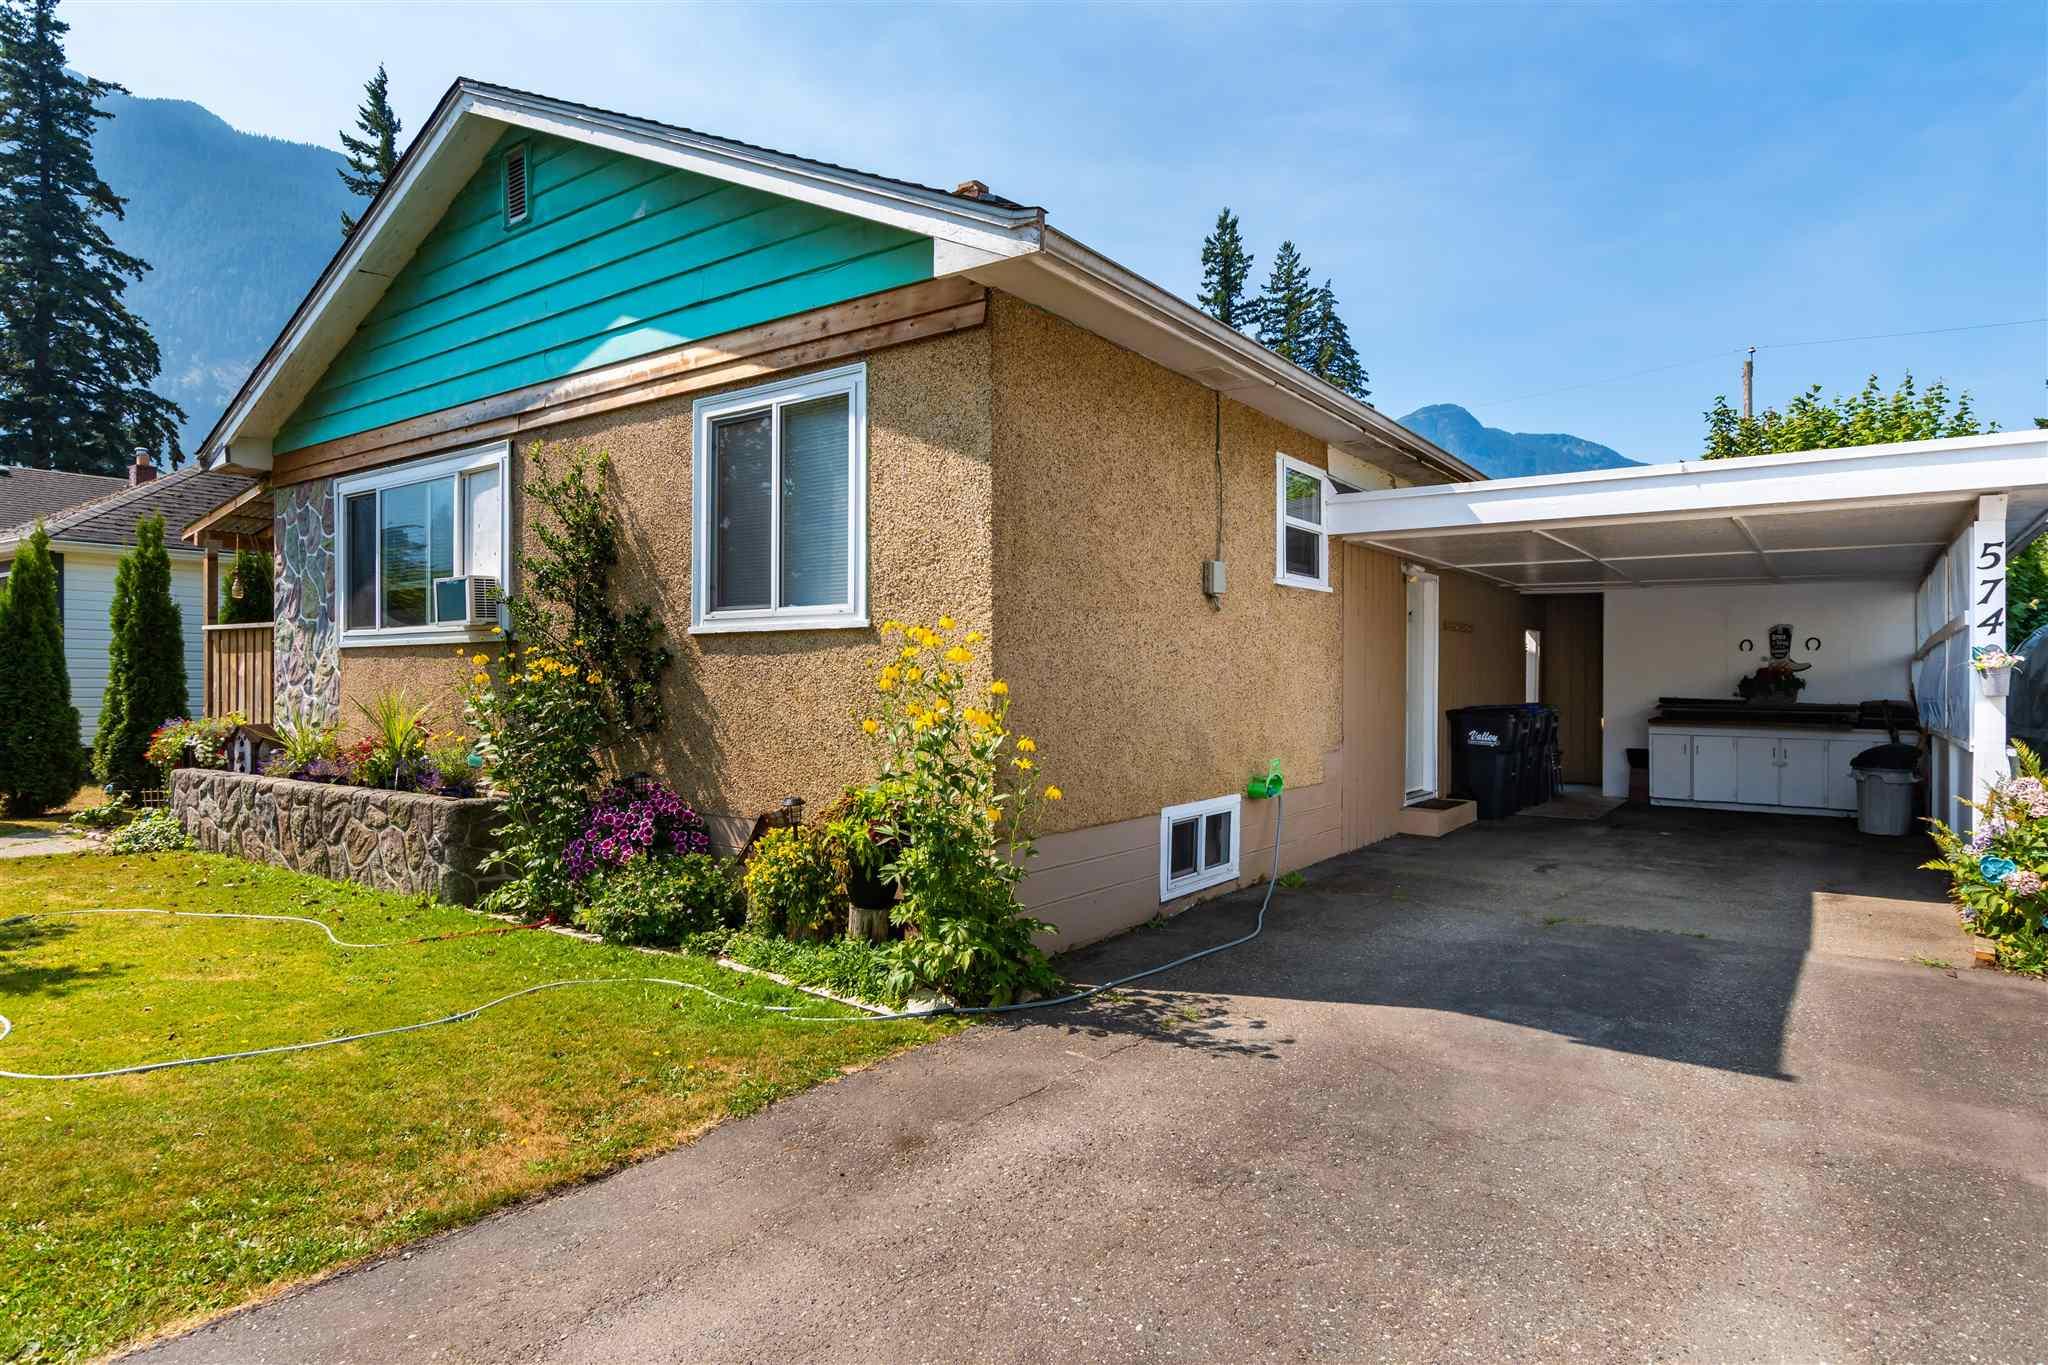 574 HEMLOCK AVENUE - Hope Center House/Single Family for sale, 3 Bedrooms (R2606013)